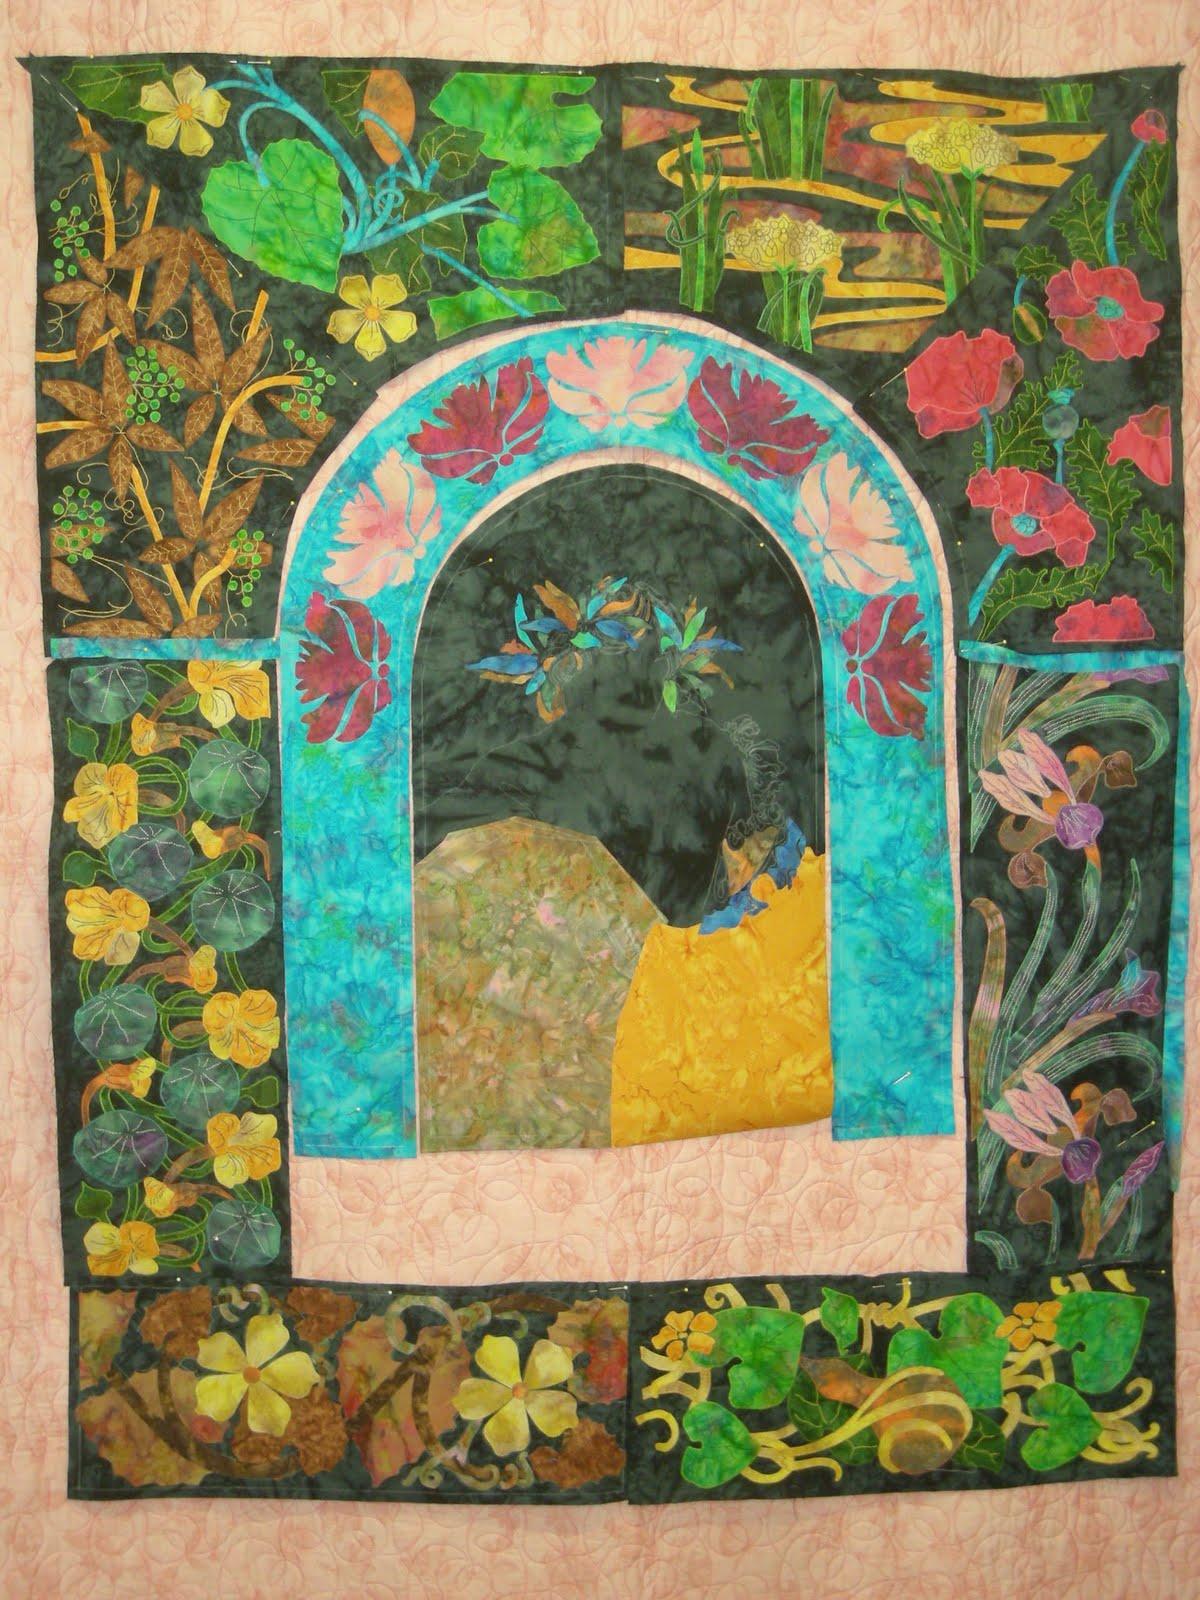 Koolkat's Quilting Blog: Art Nouveau Garden Starts To Bloom